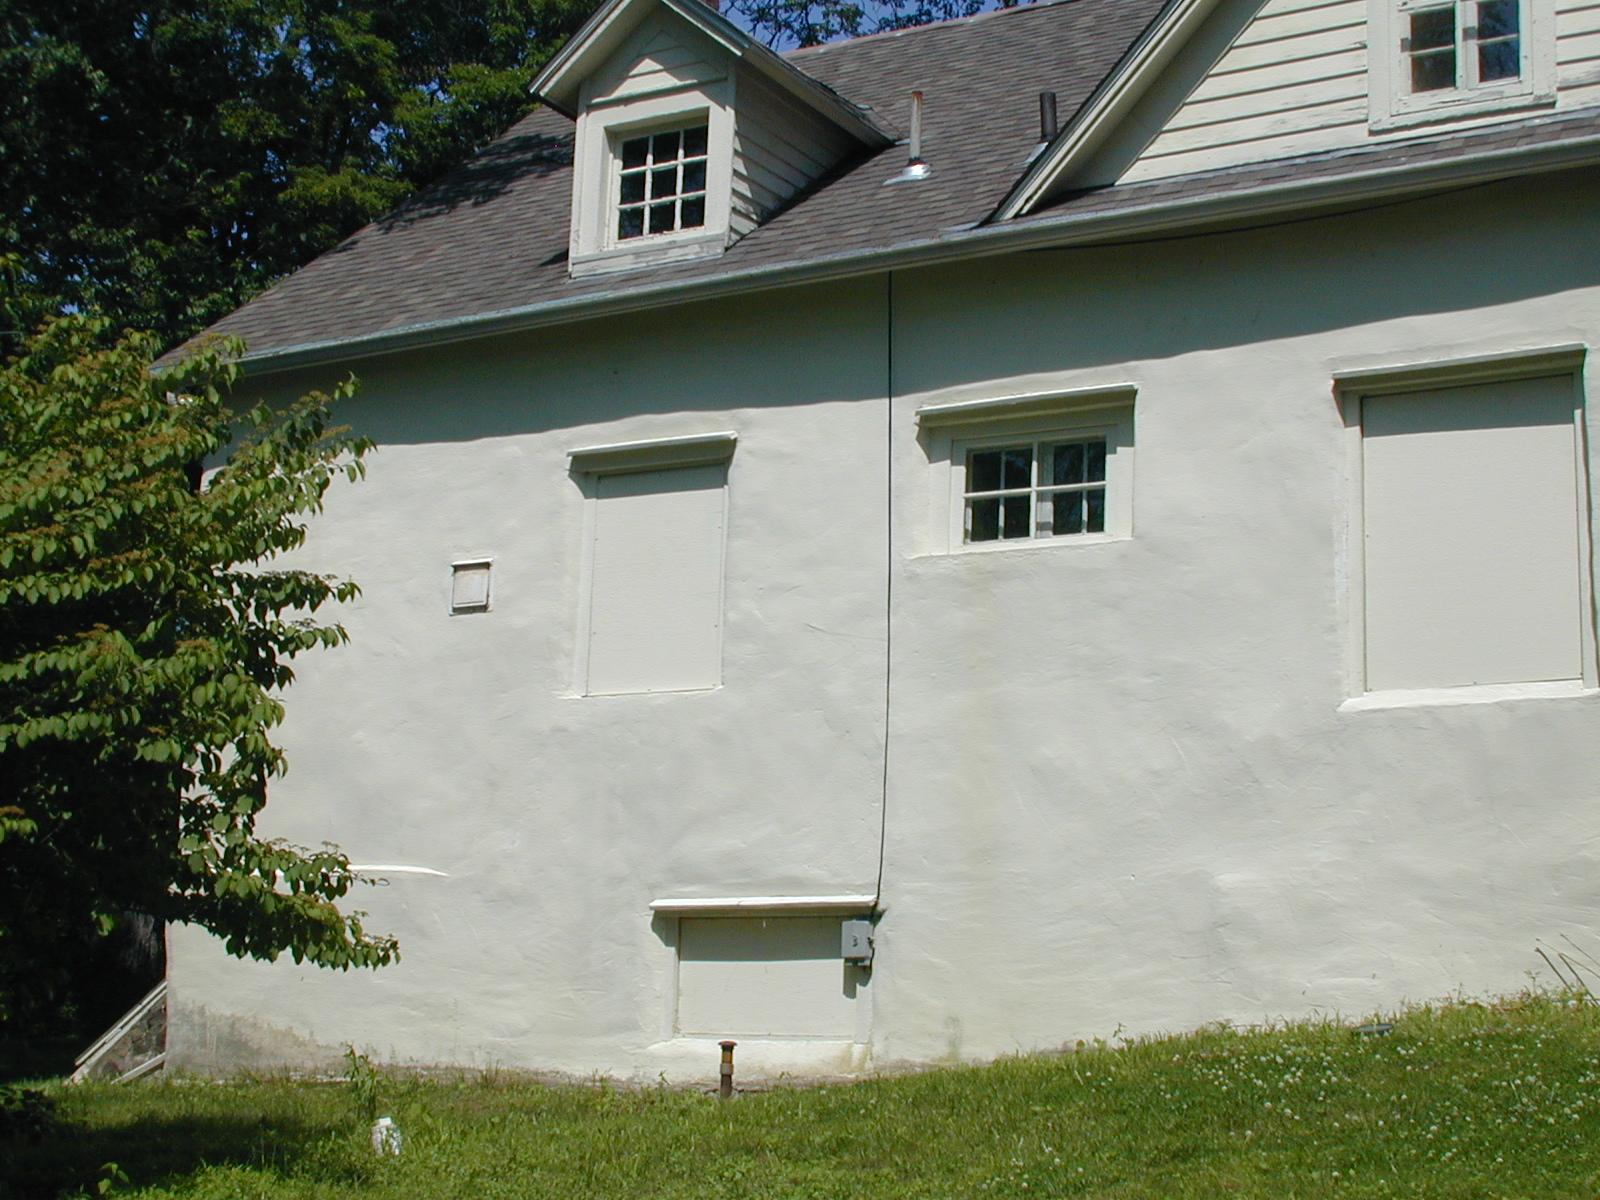 Ribble house, roadside view